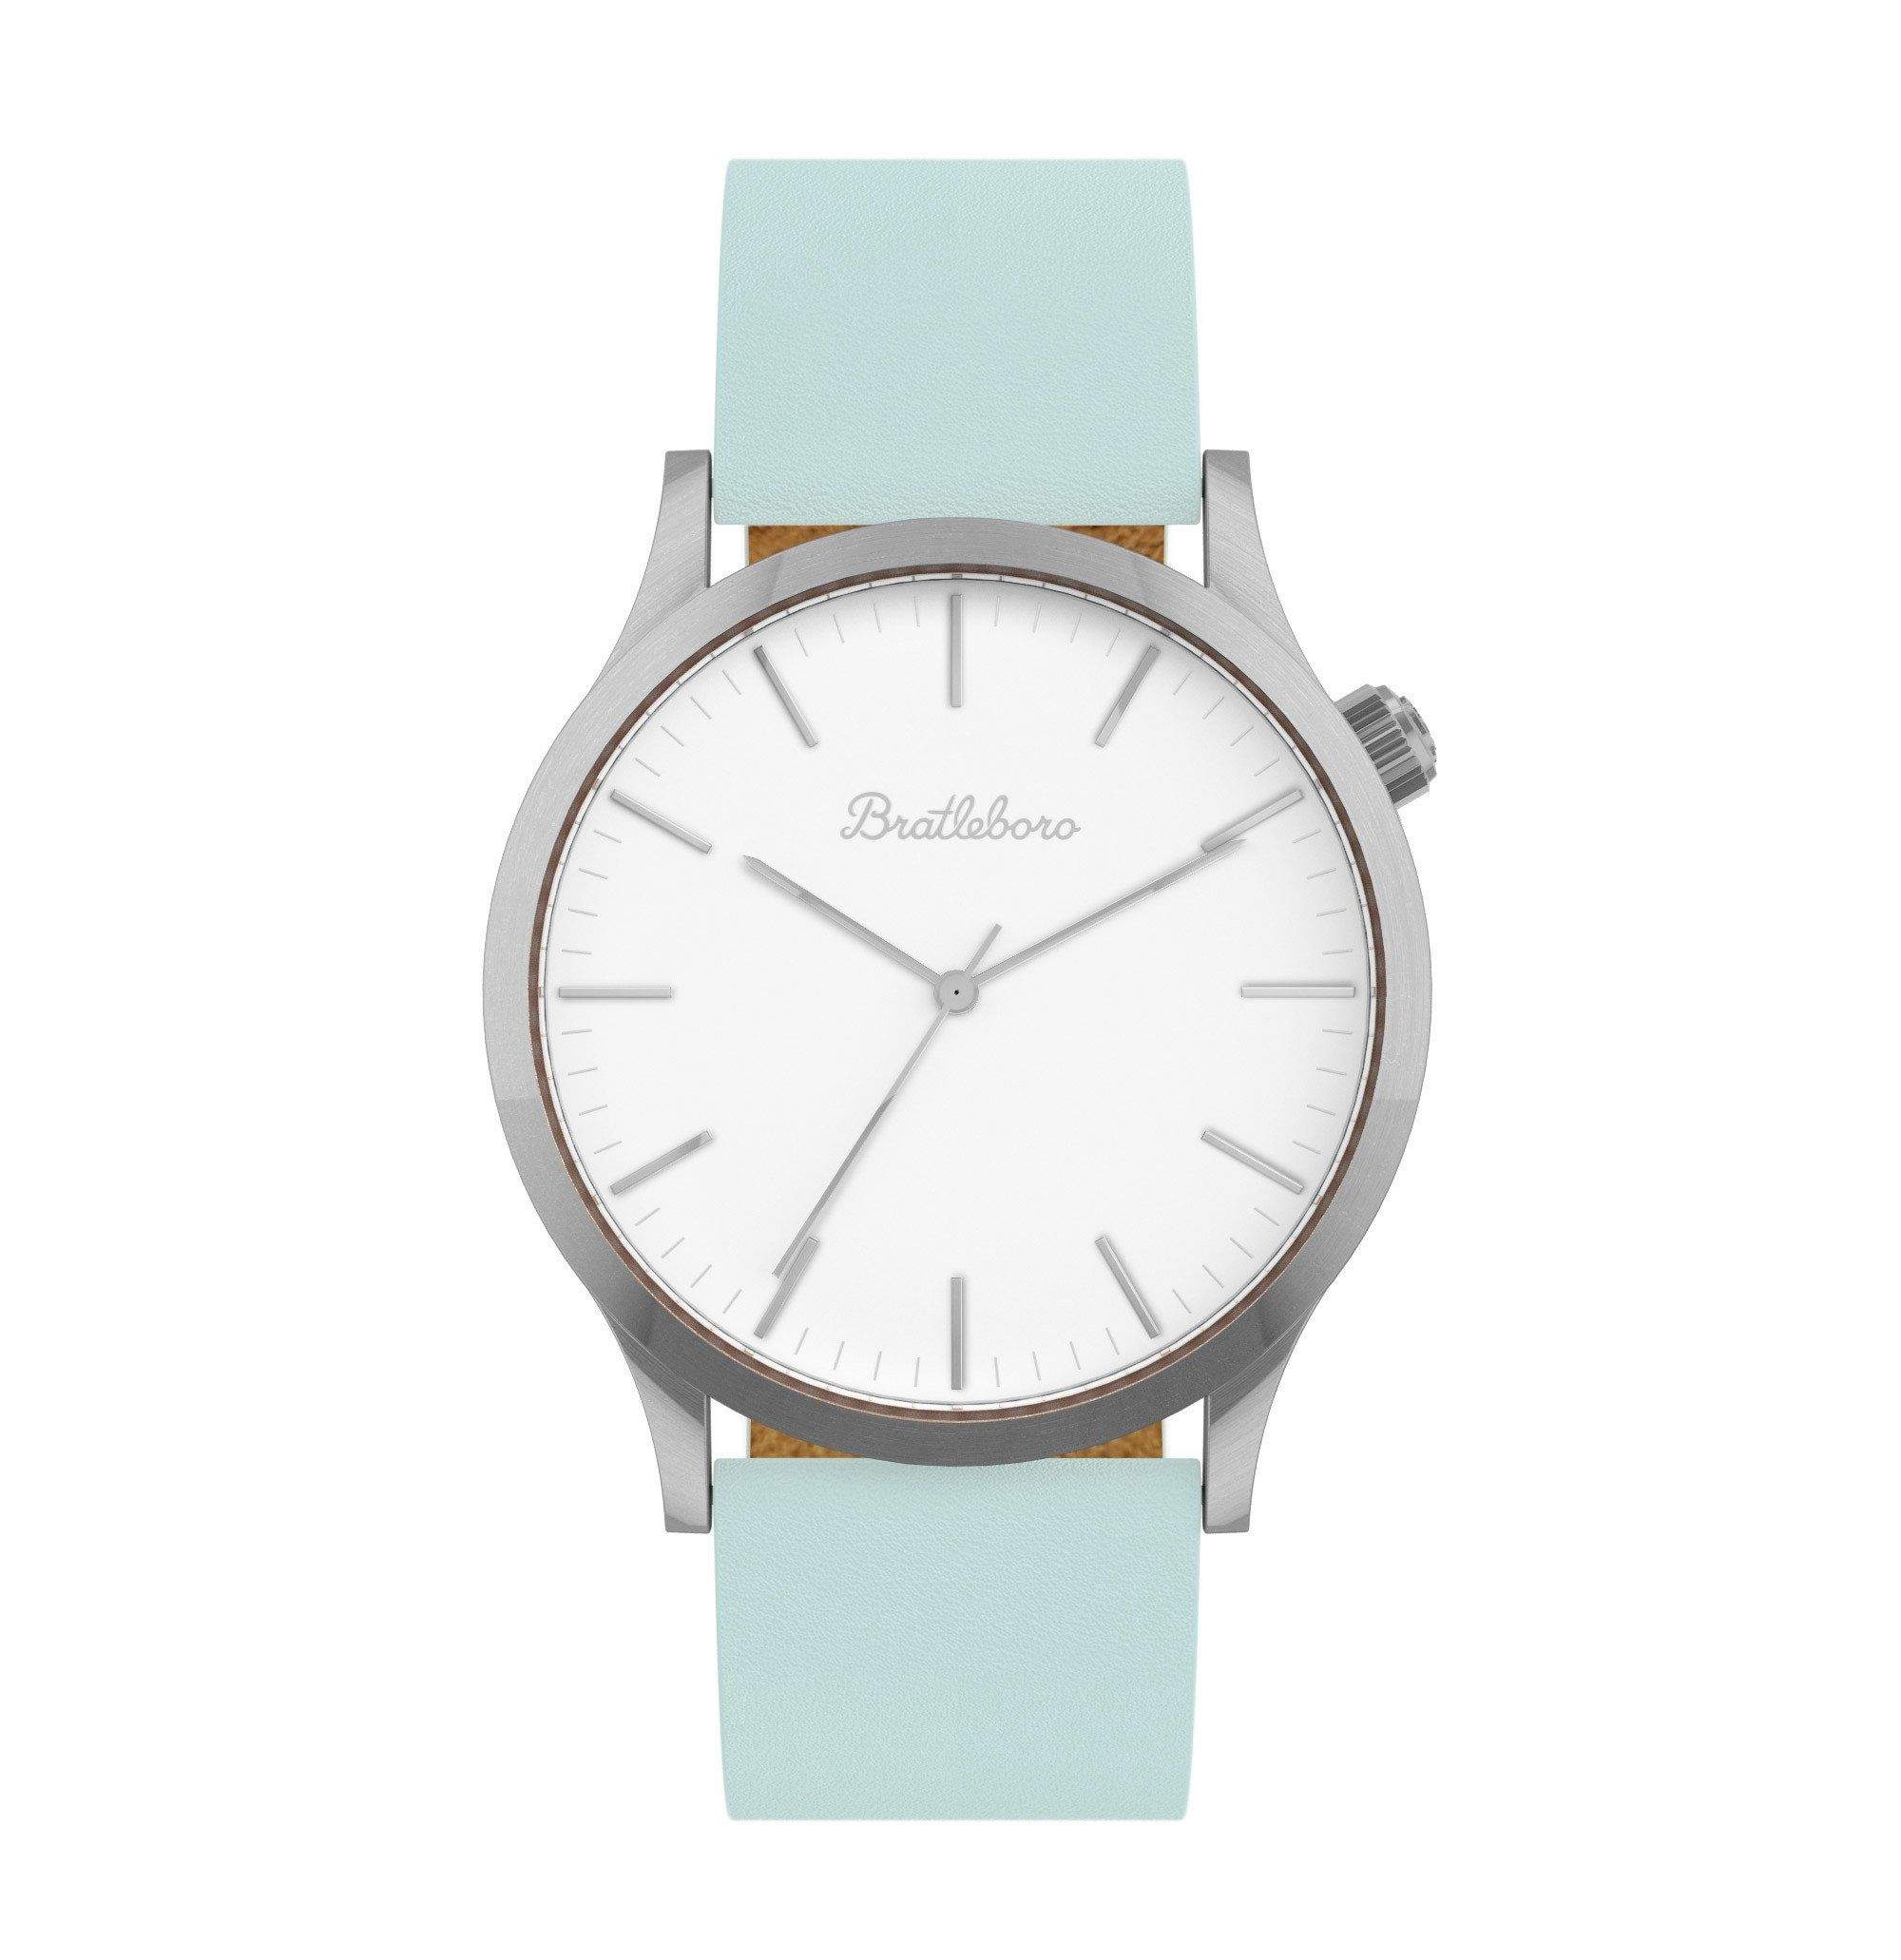 242ffb3c4151 Reloj analógico para mujer BRATLEBORO modelo AQUA GREEN con esfera blanca